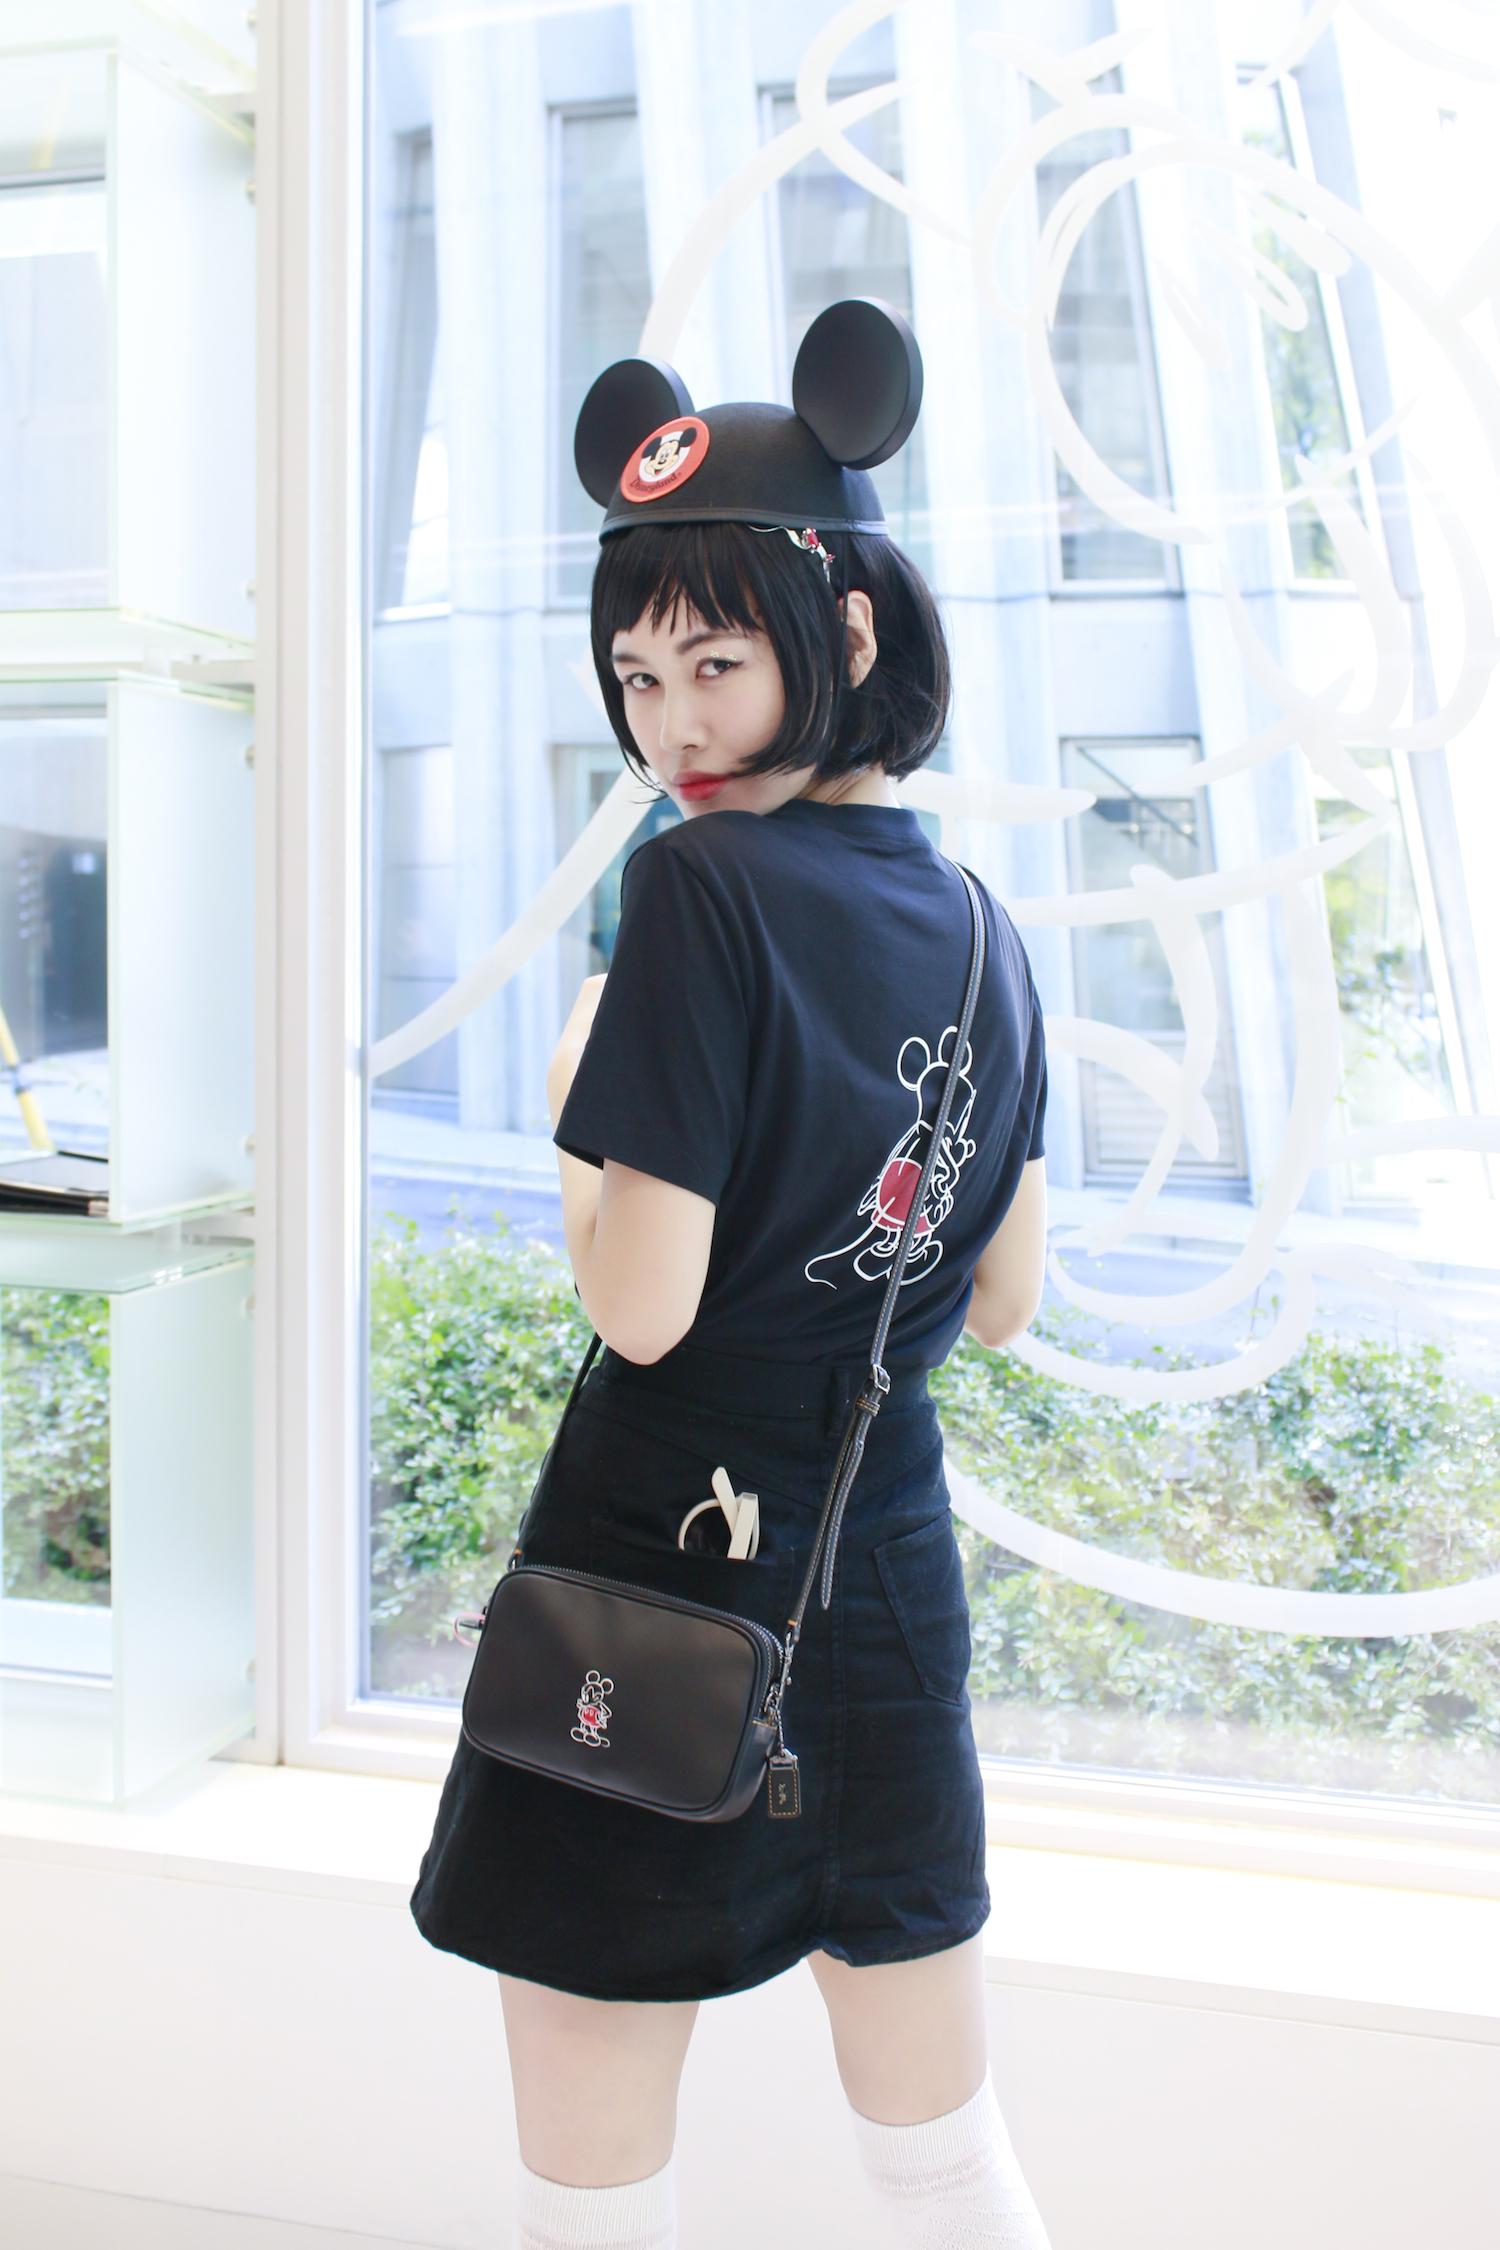 DisneyxCoach_Omotesando_21